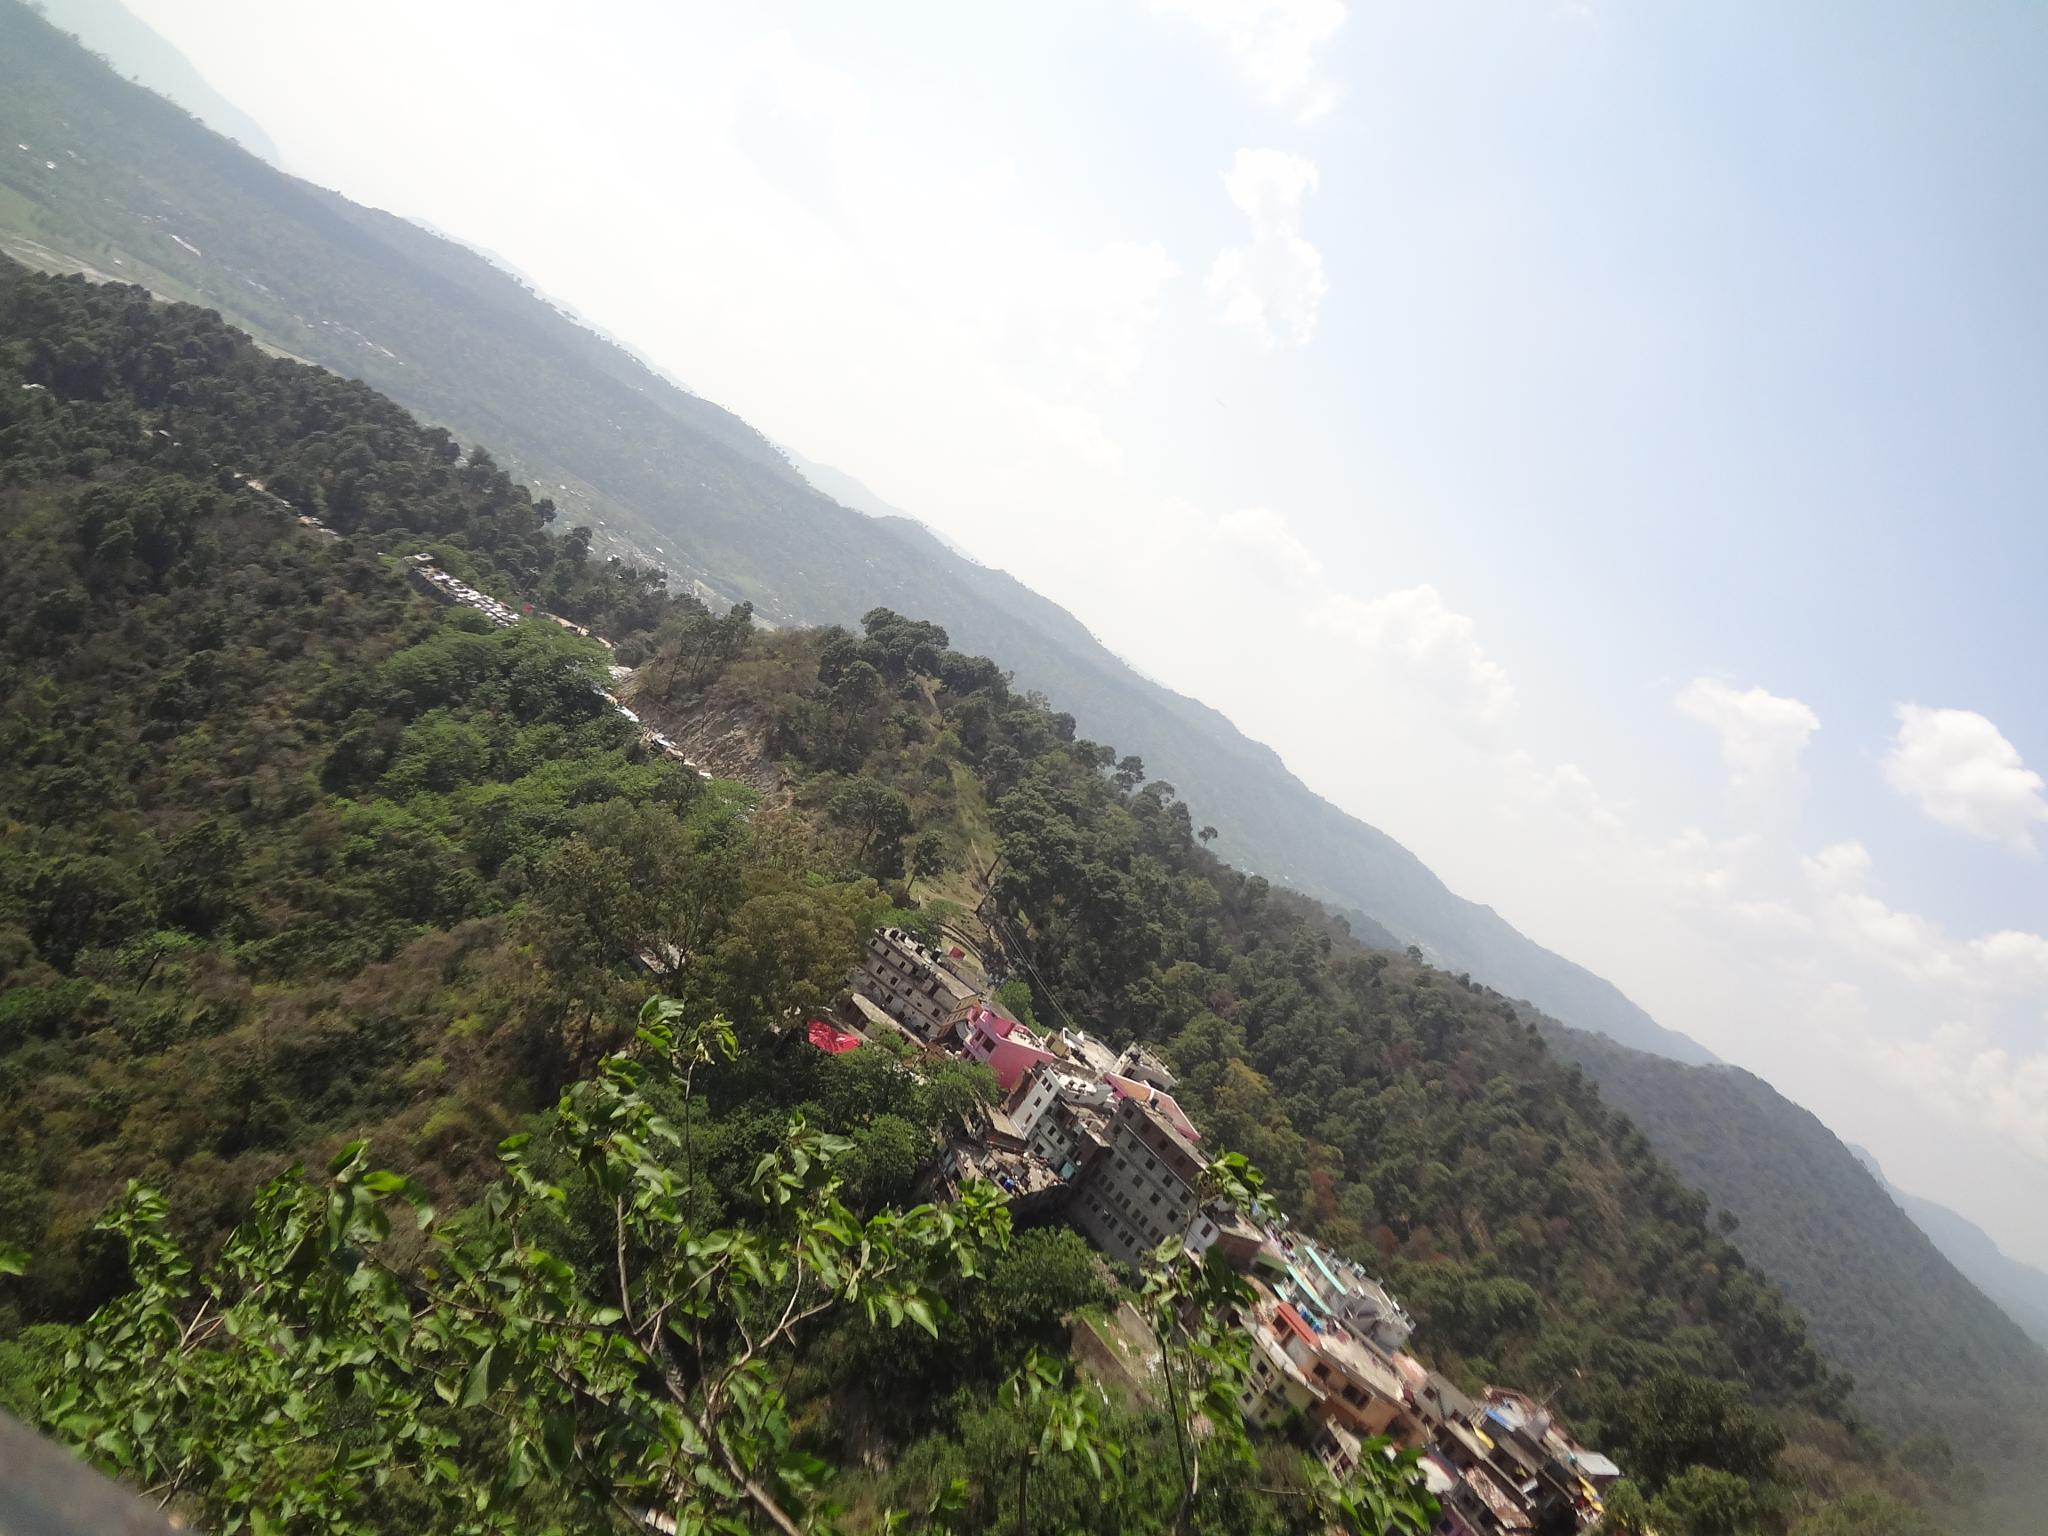 NIT hamirpur by Rajesh Kumar